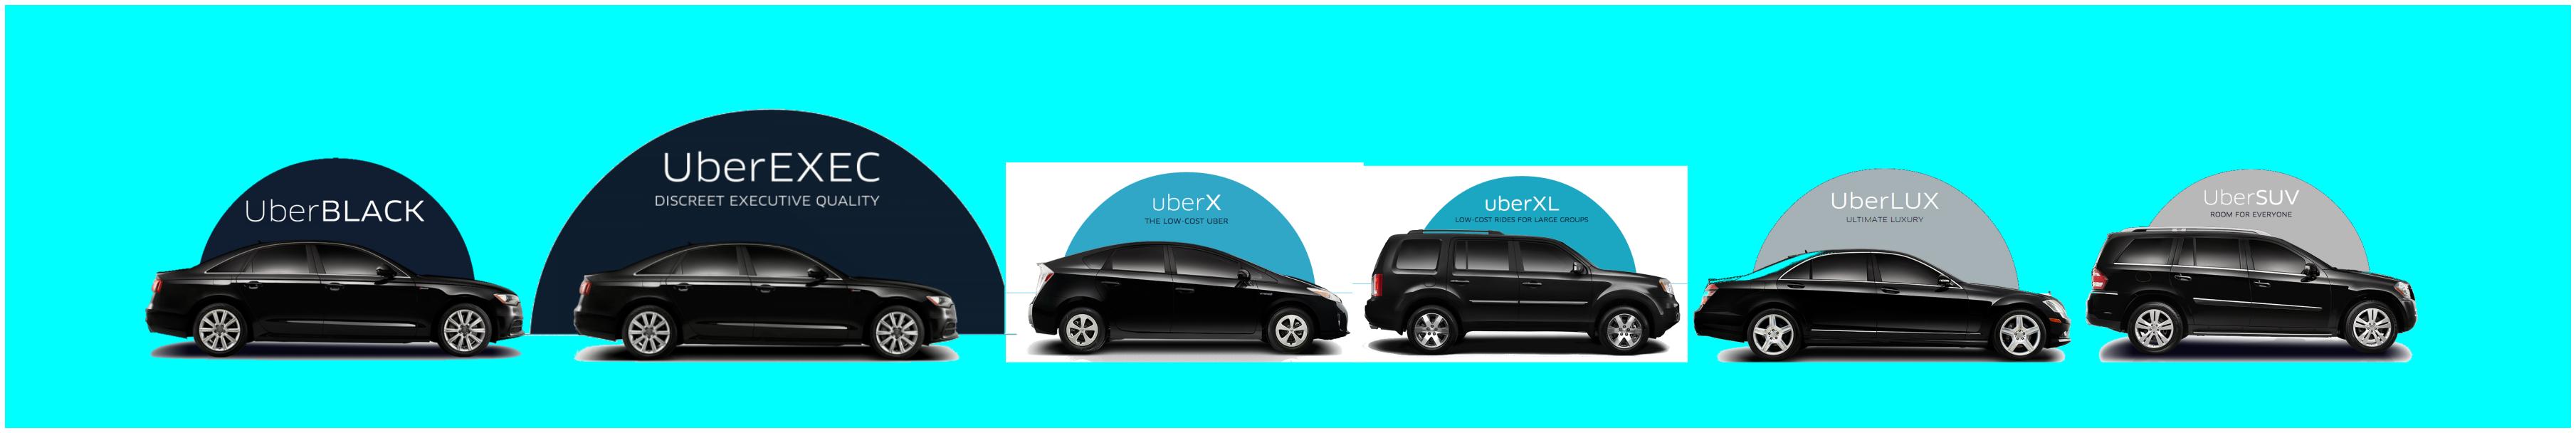 uber classes